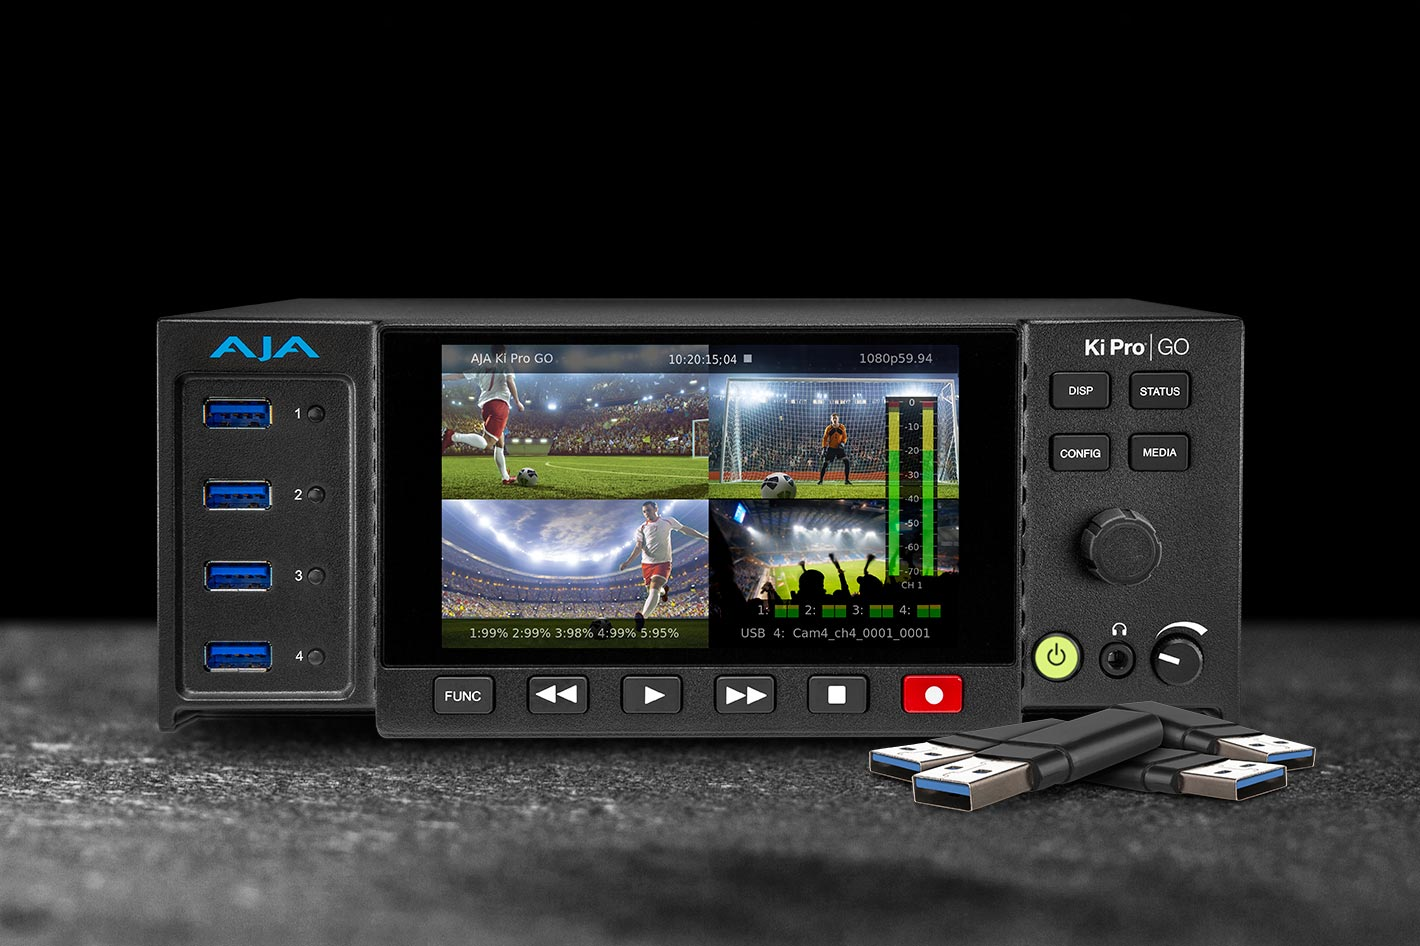 AJA upgrades Ki Pro GO H.264 recorder and player